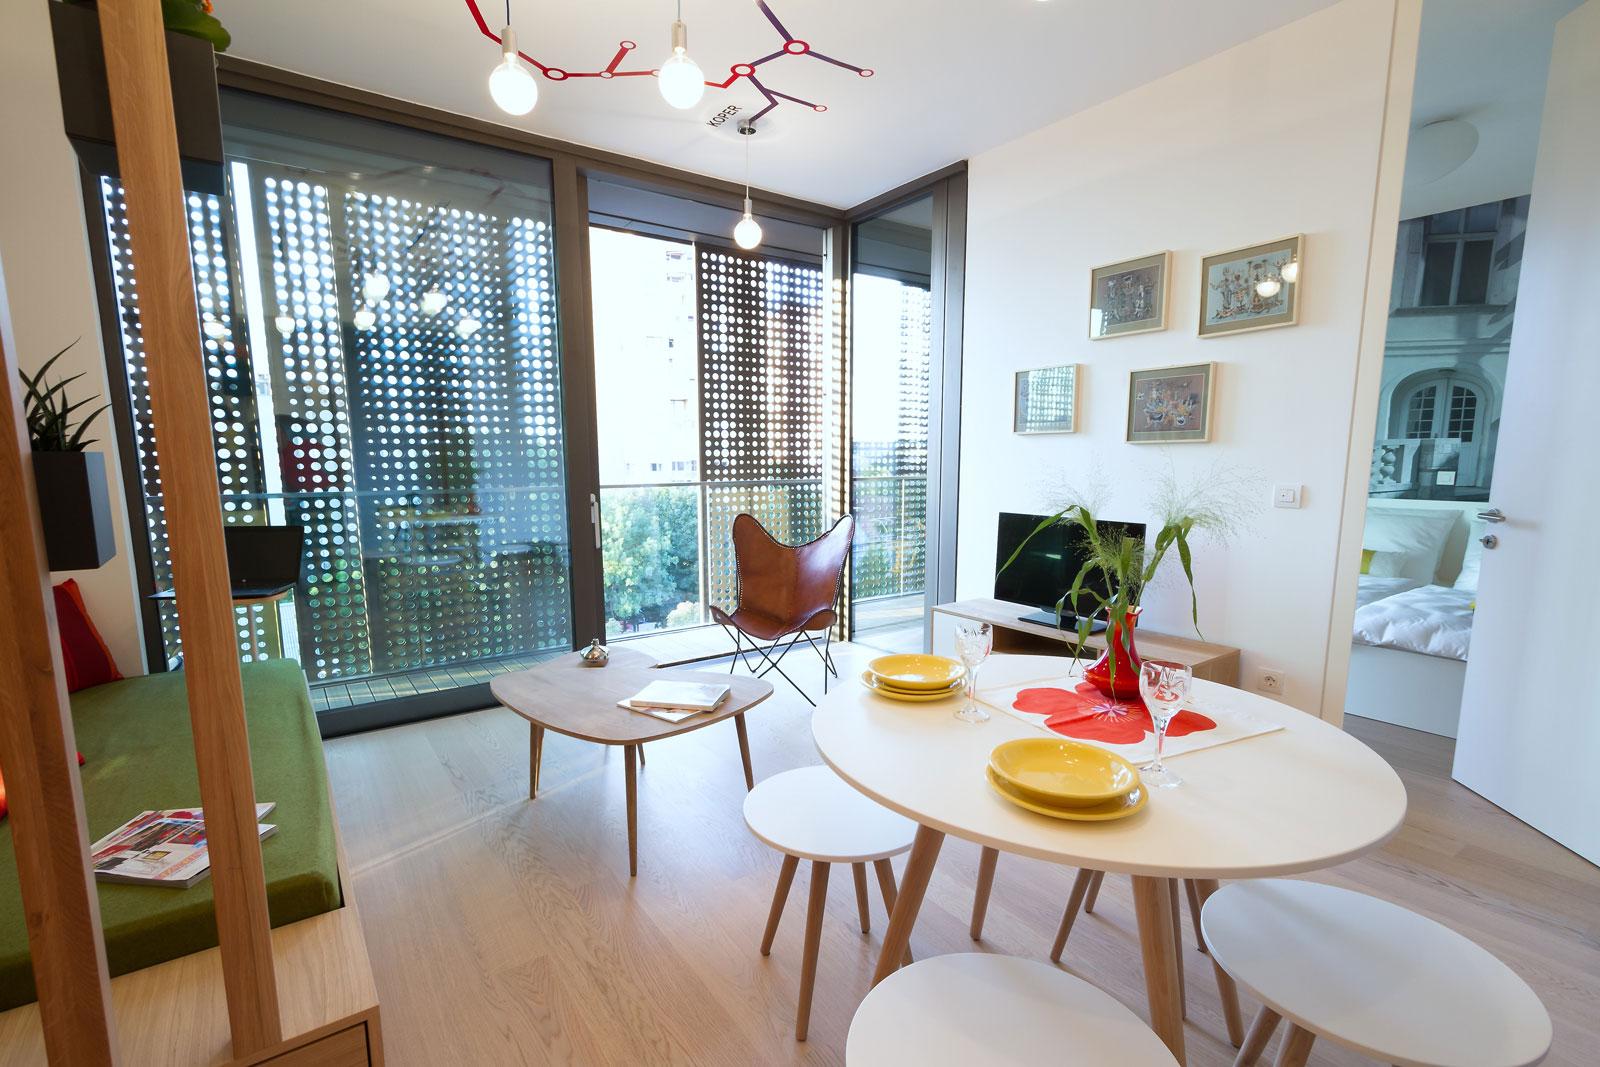 Apartment in Ljubljana by GAO architects-13